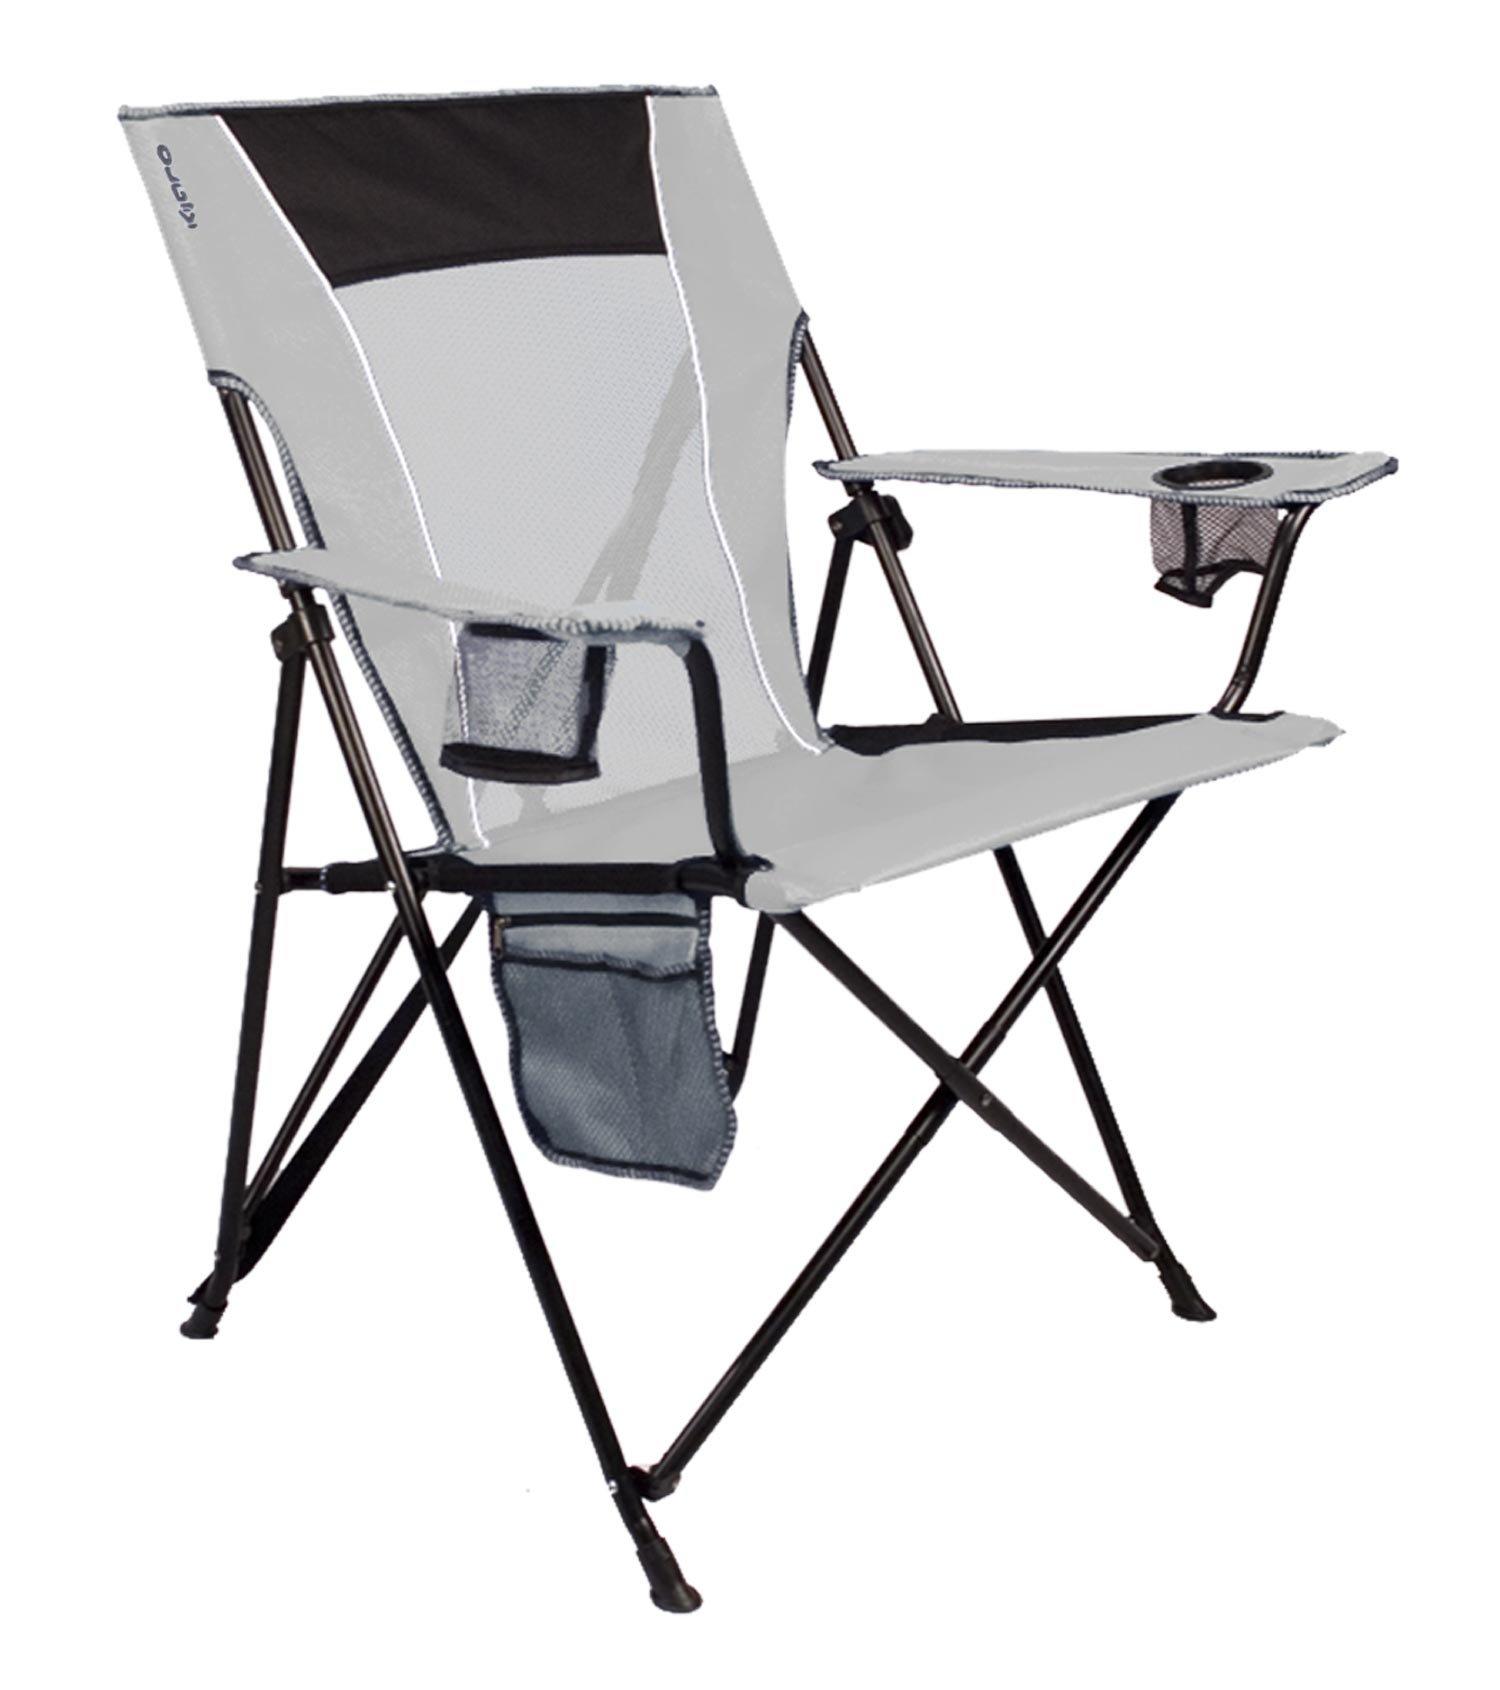 kijaro dual lock folding chair xxl summer deck chairs cupertino classic gray ebay